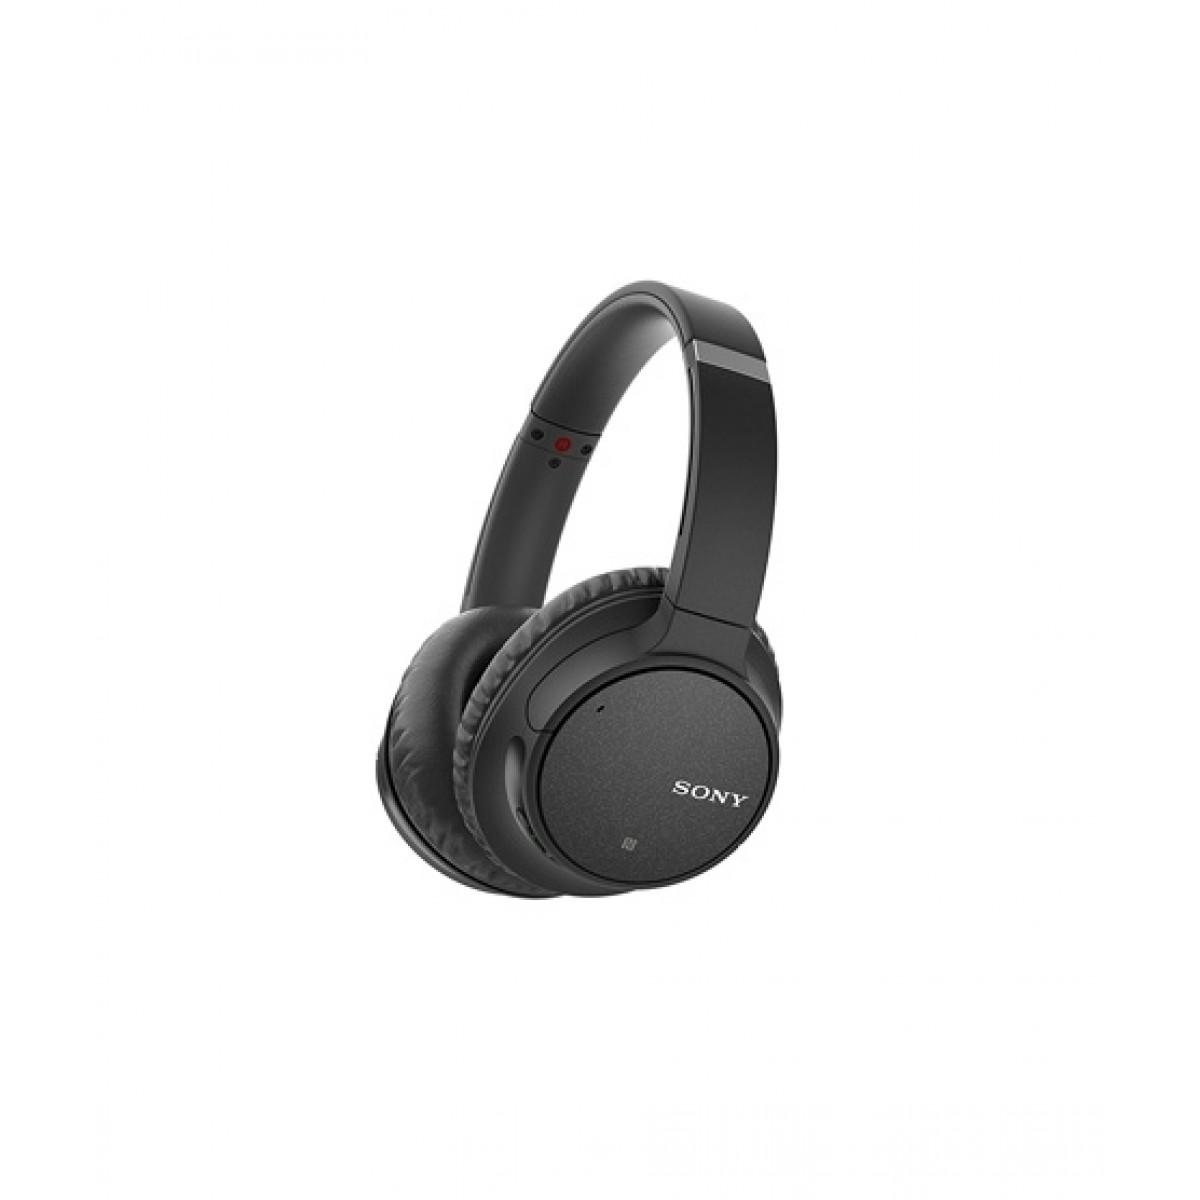 562d63396b6 Sony WH-CH700N Wireless Headphones Price in Pakistan | Buy Sony WH-CH700N  Wireless Noise Canceling Headphones | iShopping.pk